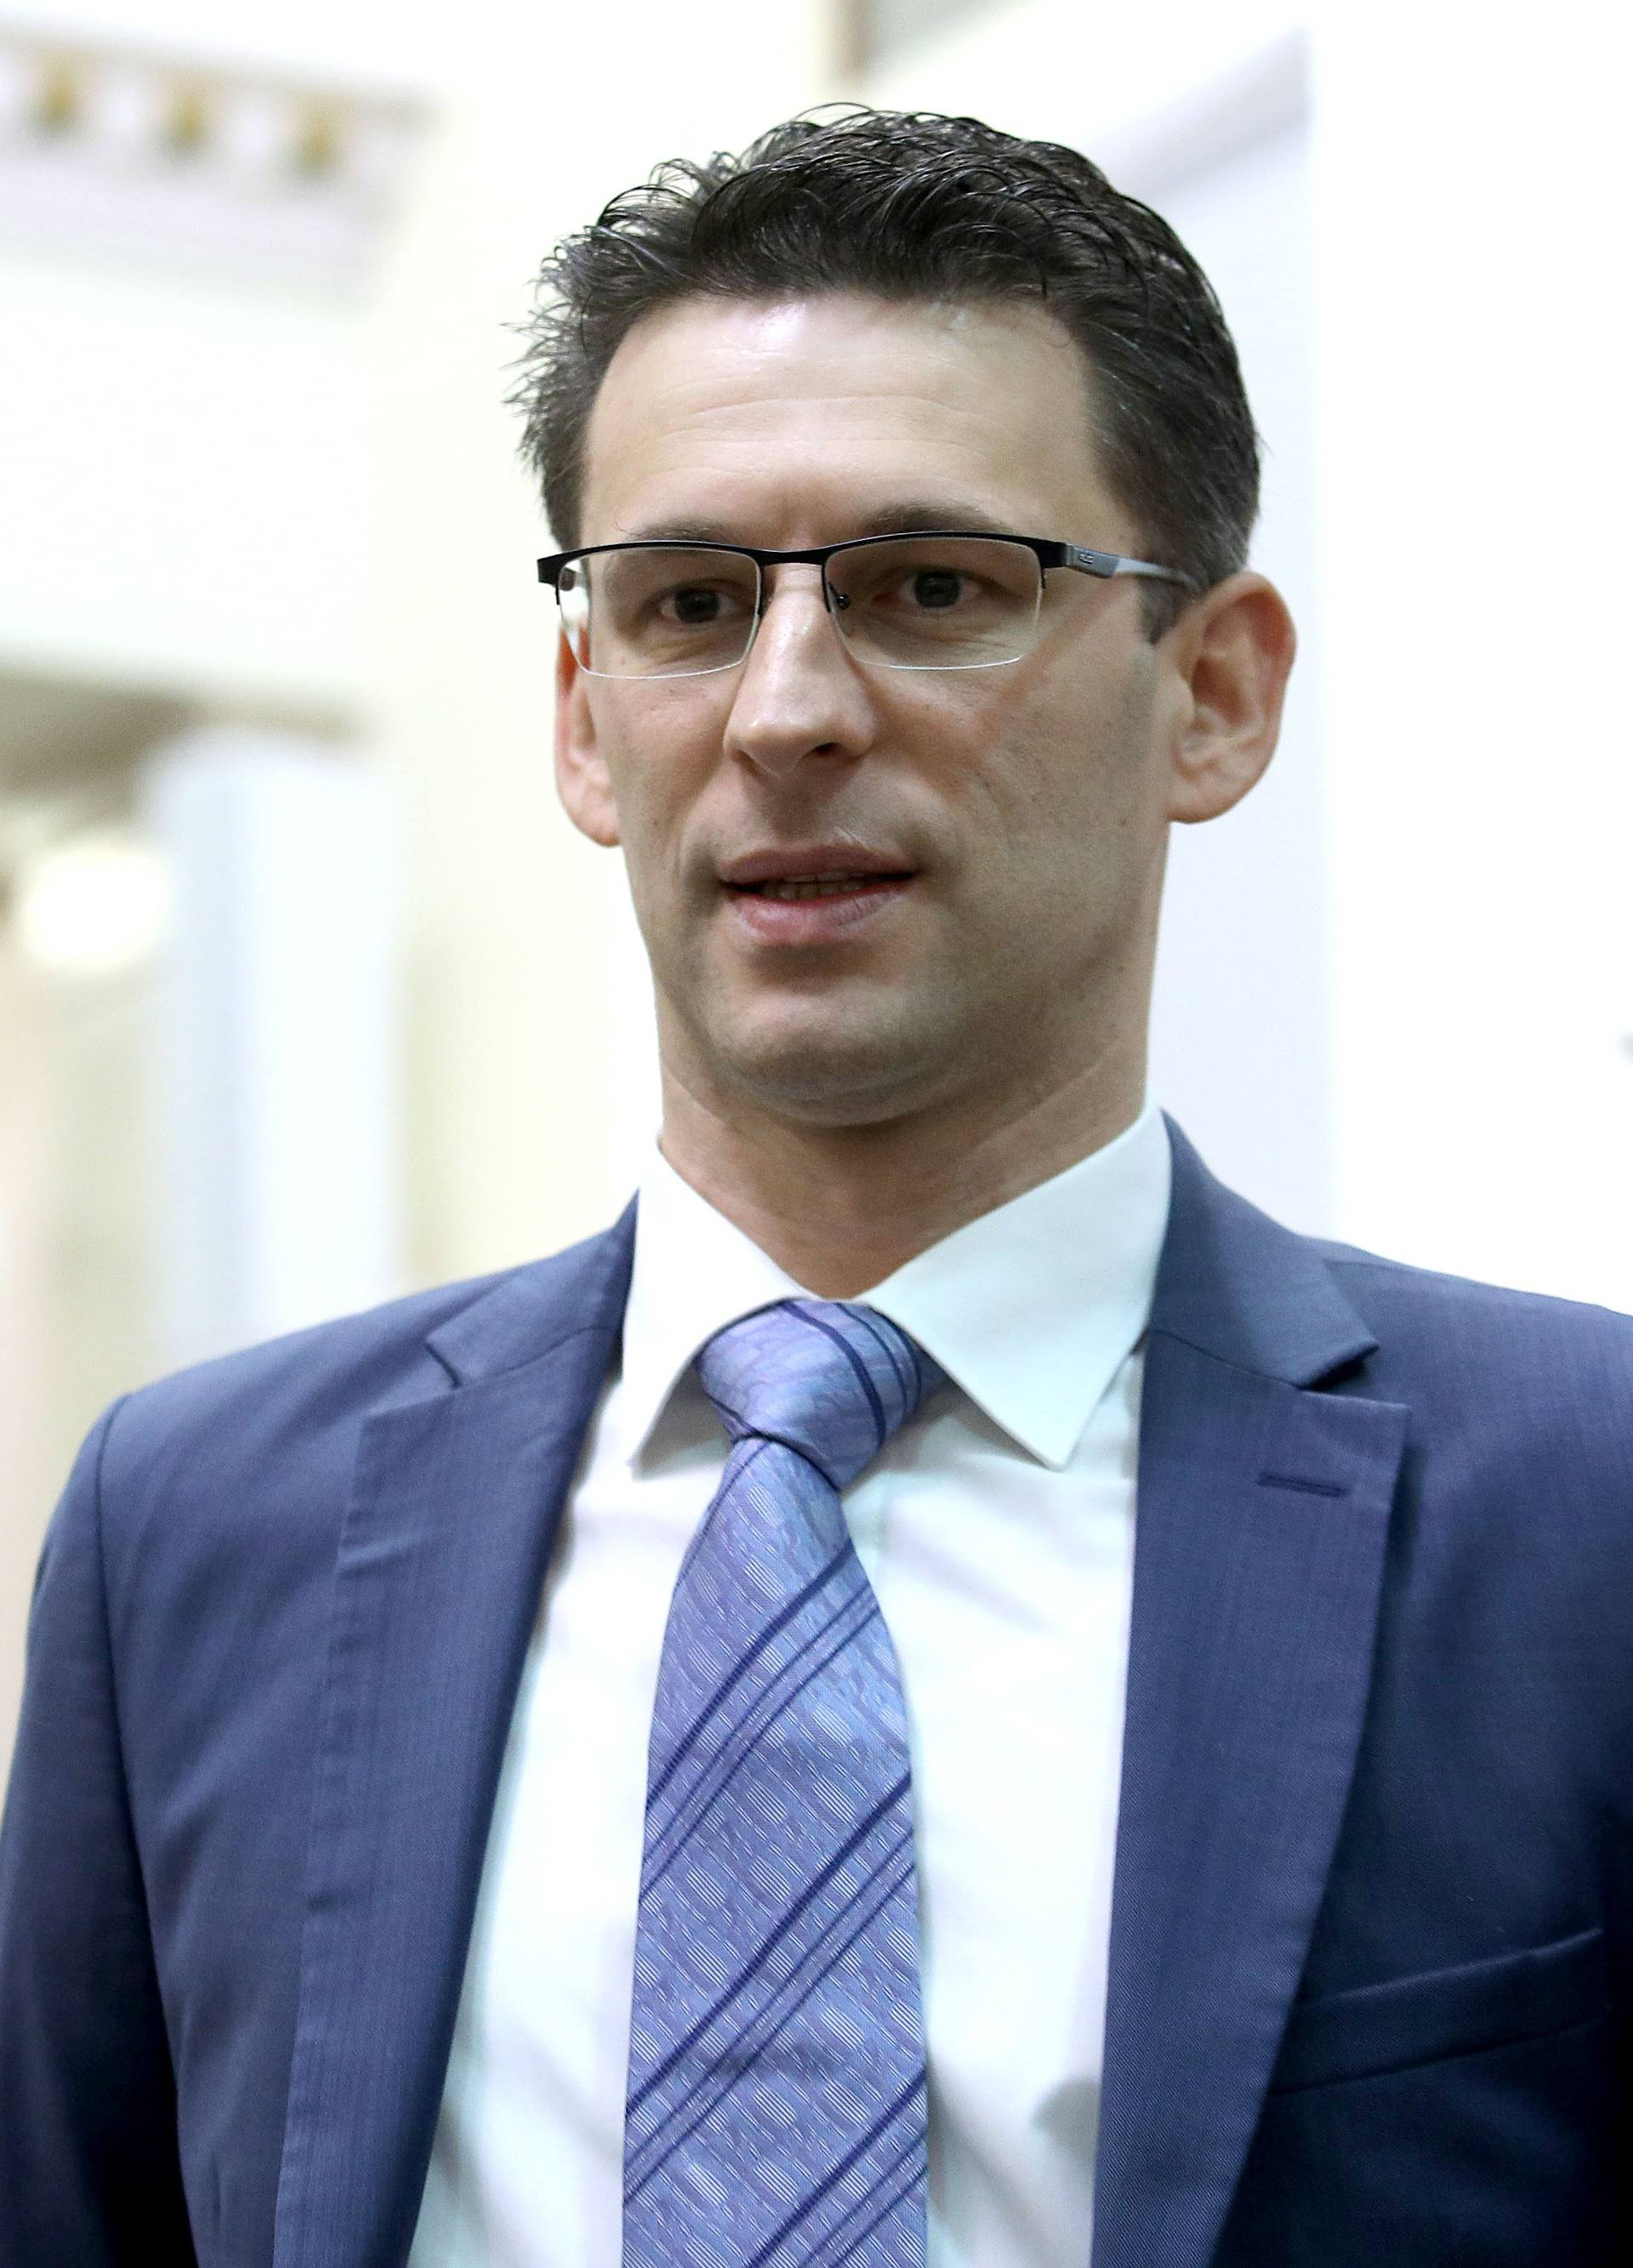 Zagreb: Sabor bira povjerenika za informiranje